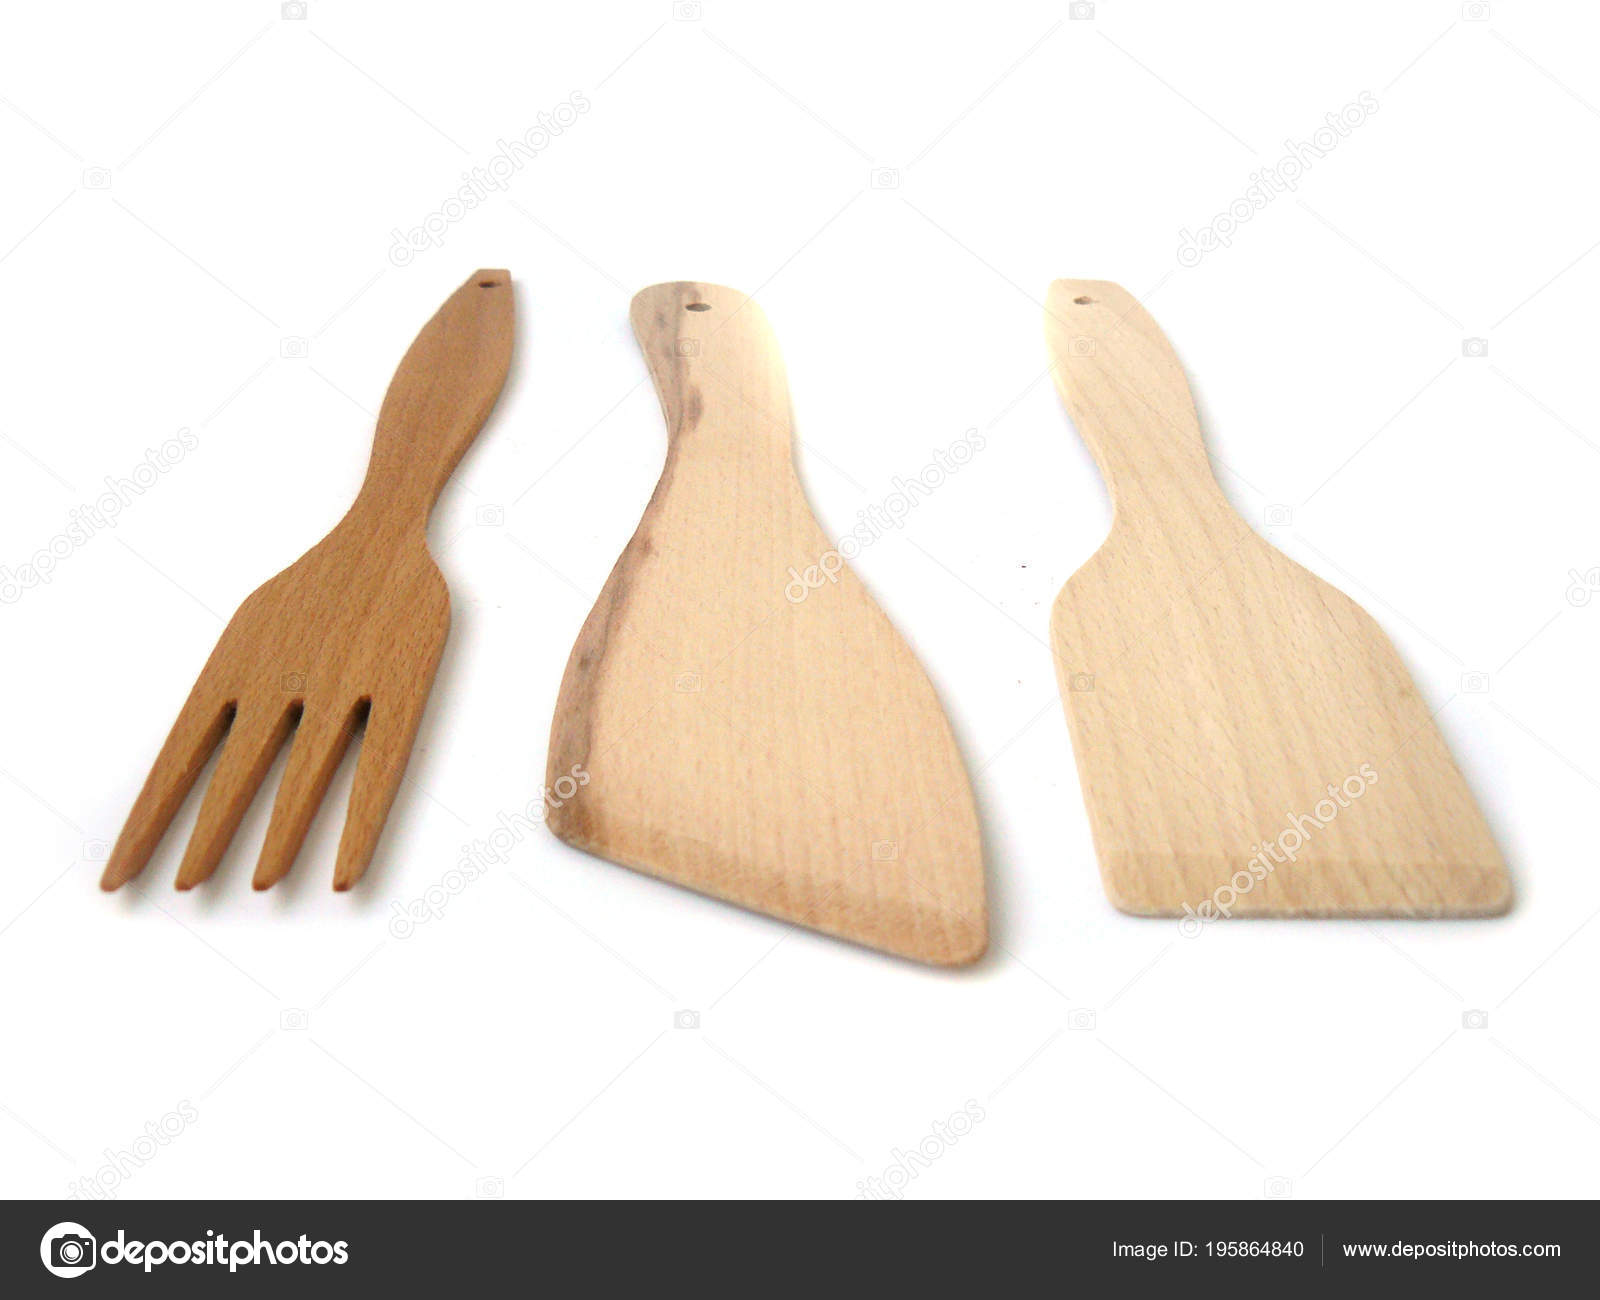 wood kitchen set pictures of remodeled kitchens 木制厨房套装厨房铲烹调用具主轴箱库存图像 图库照片 c nostalgishop